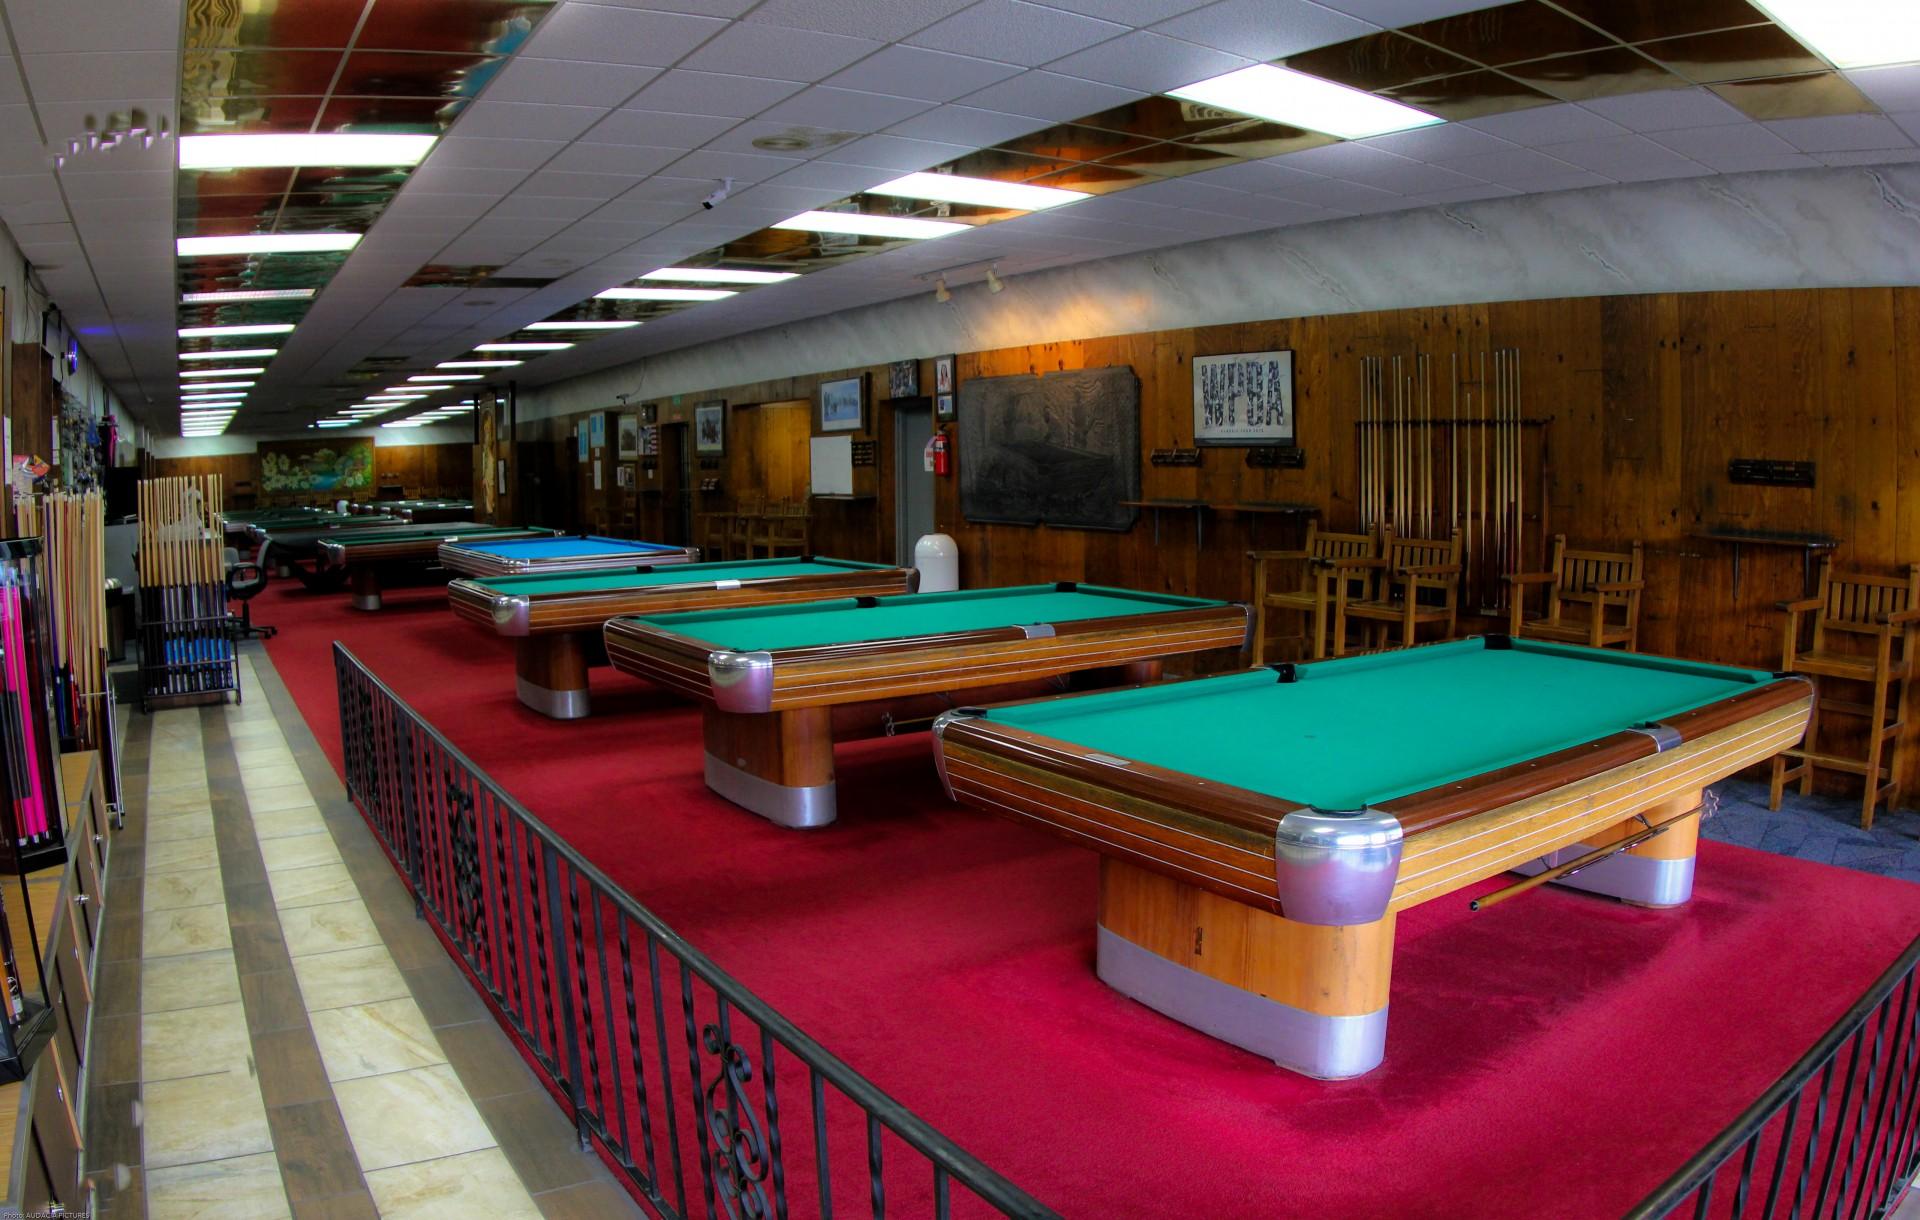 Pool Room - Pool table movers portland oregon